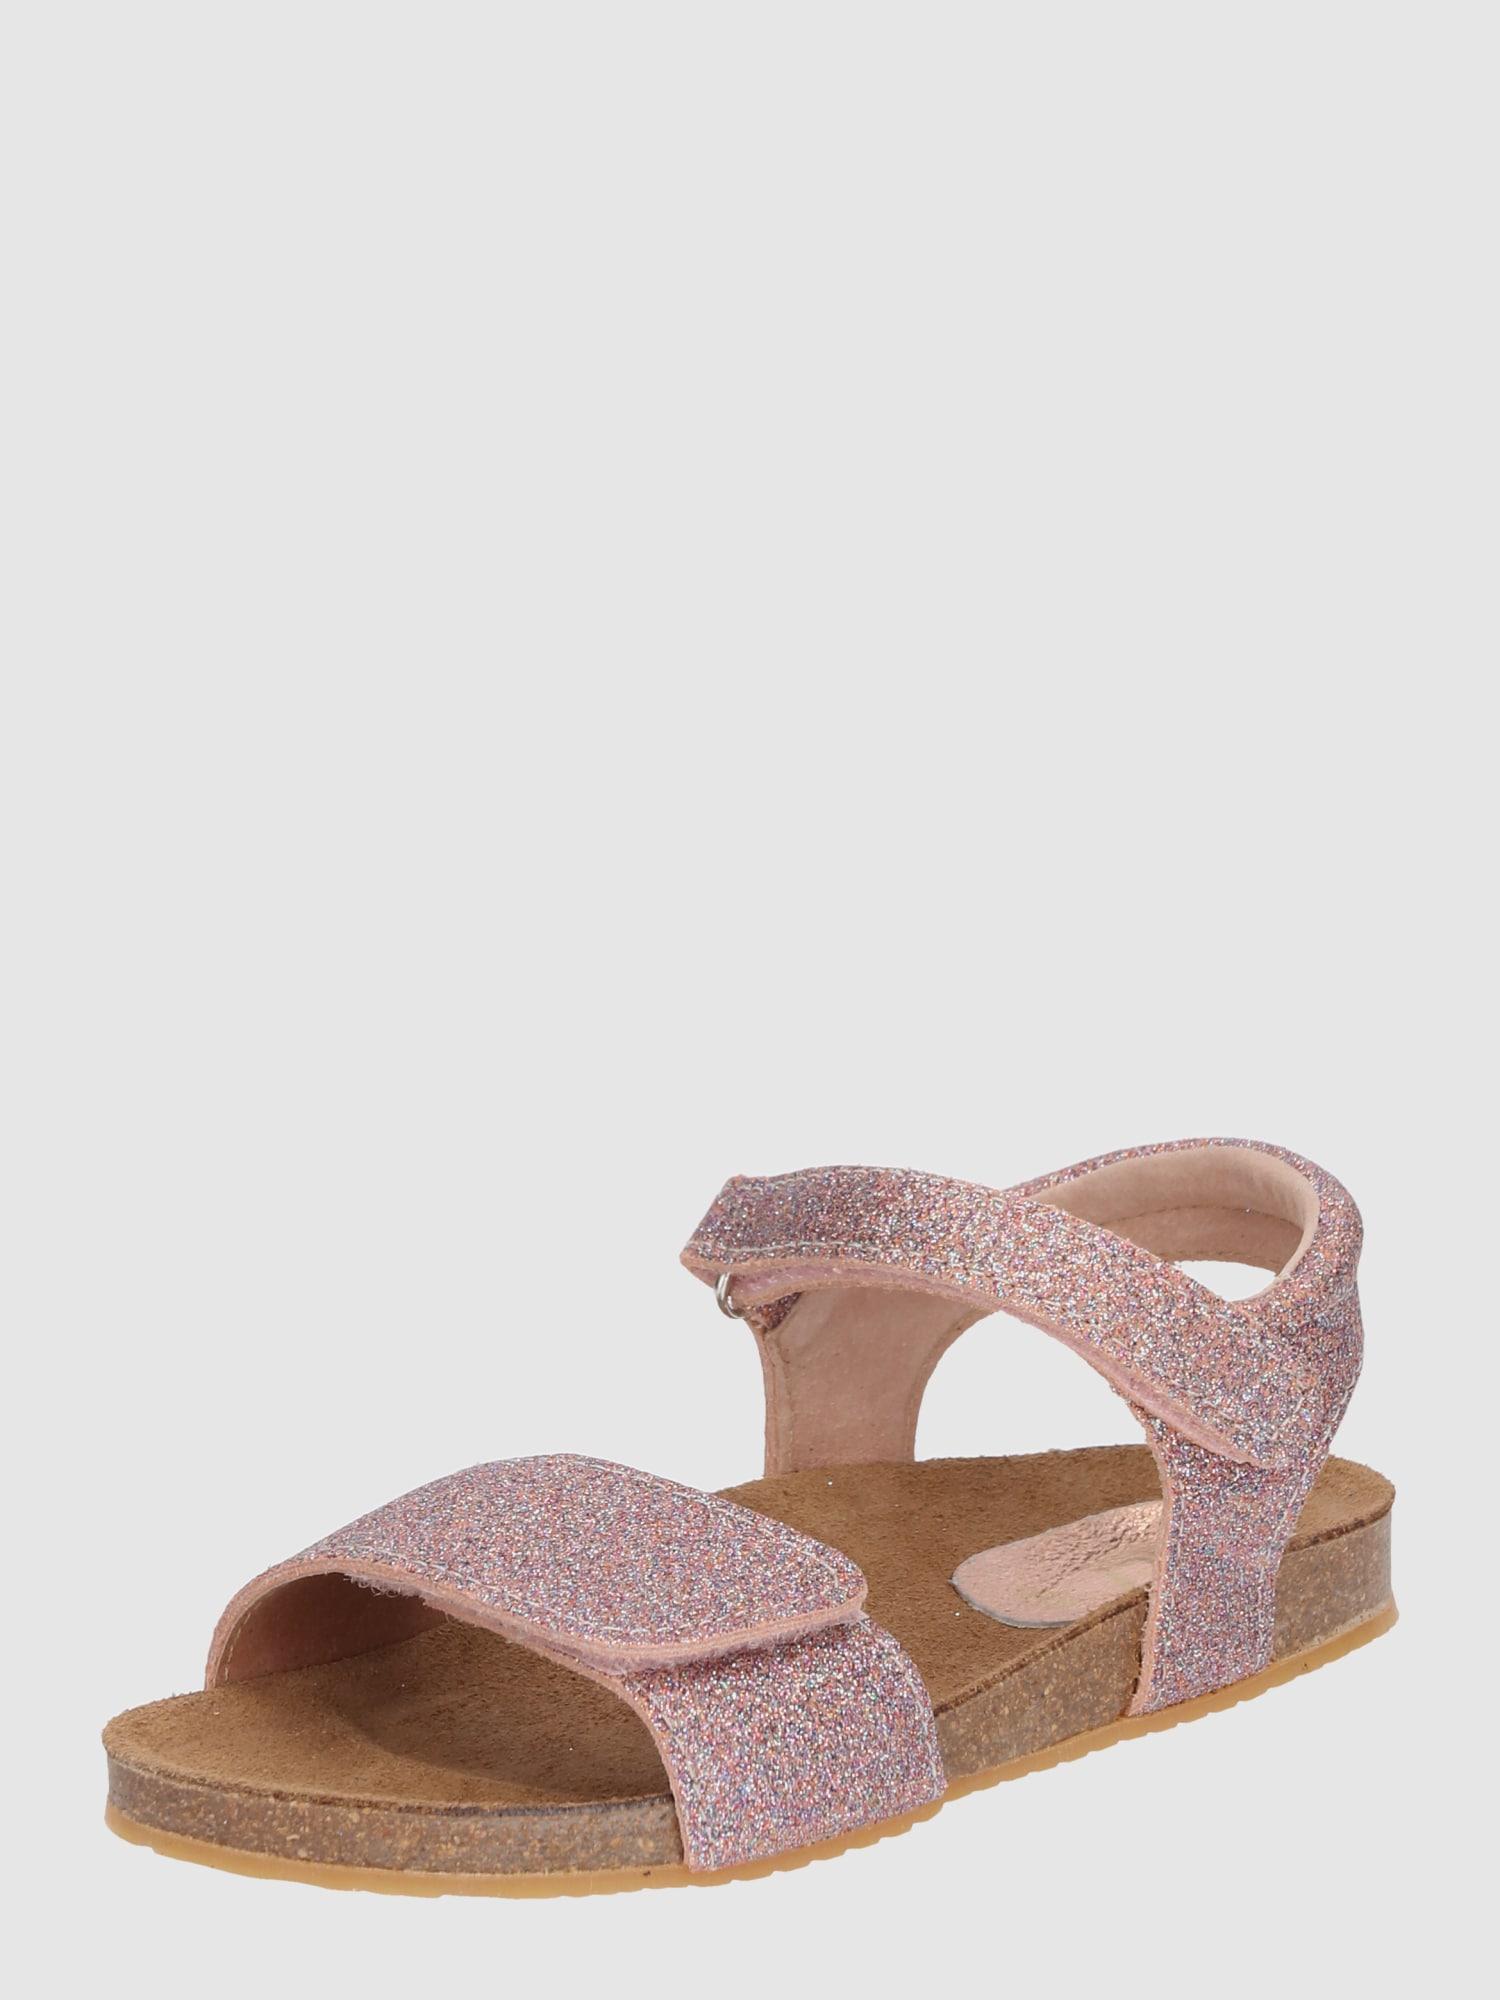 clic sandalen 39 17 39 mit glitzer effekt in pink about you. Black Bedroom Furniture Sets. Home Design Ideas